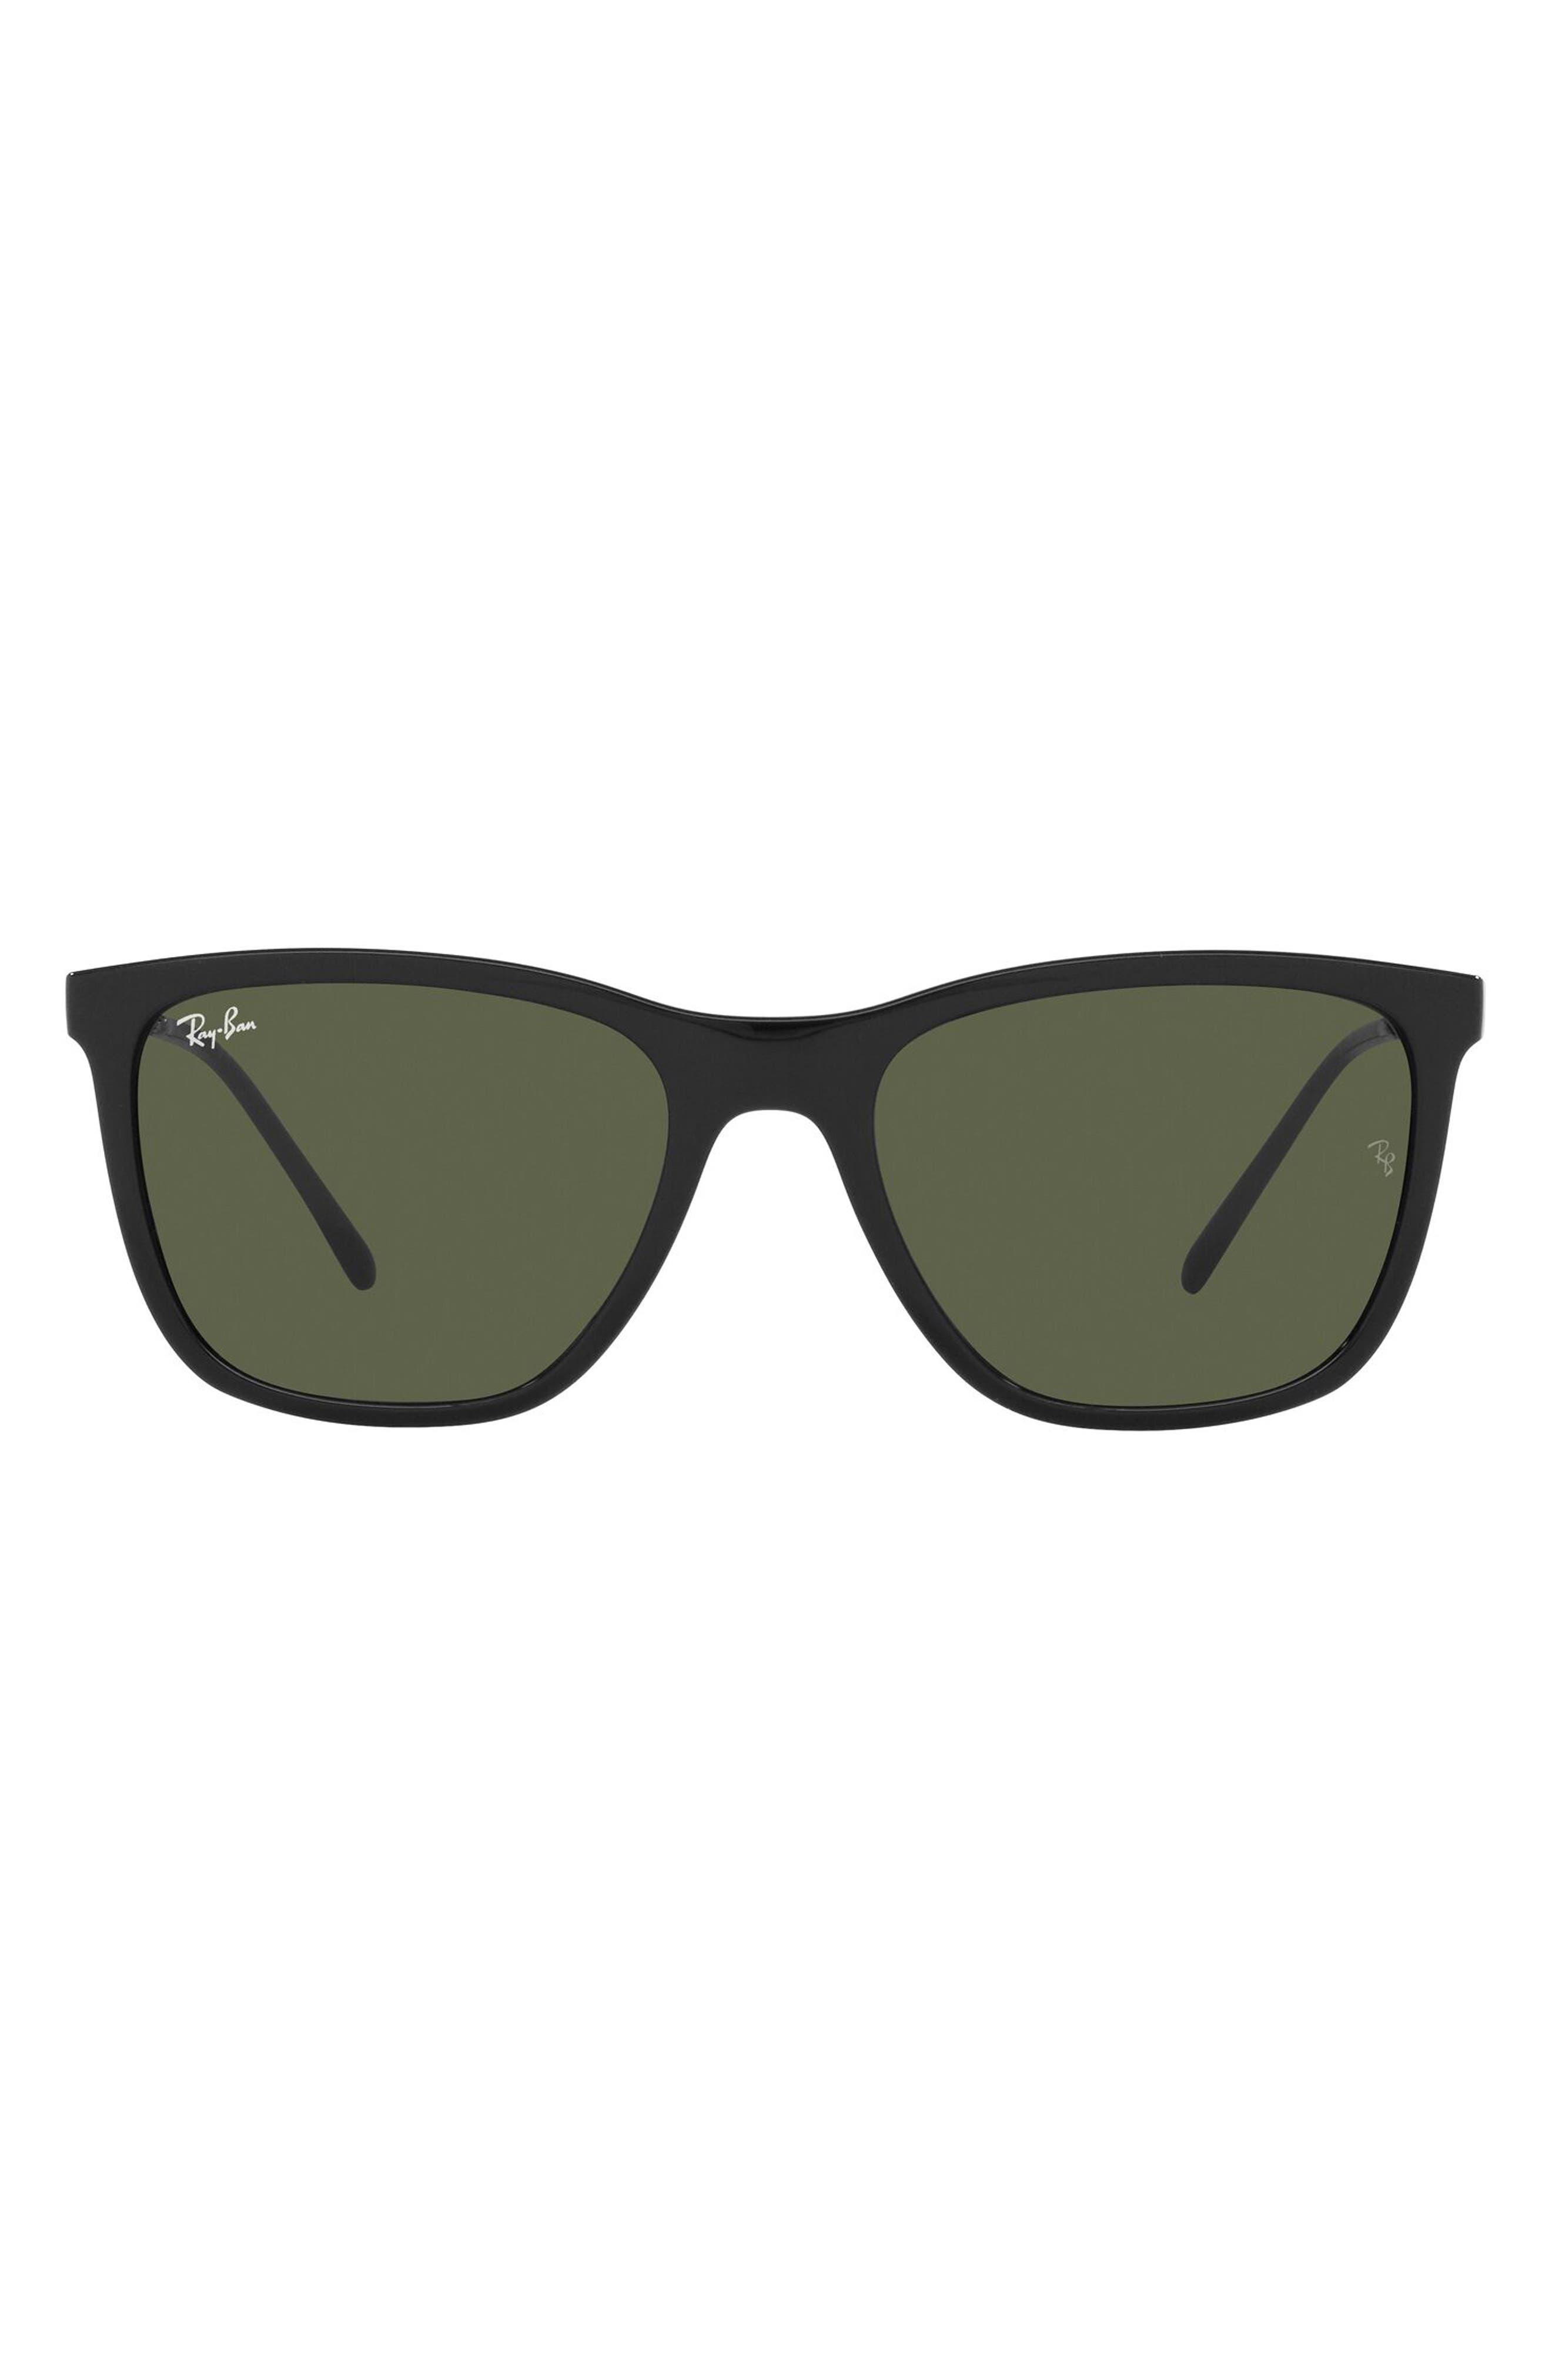 Women's Ray-Ban 56mm Pillow Sunglasses - Havana / Brown